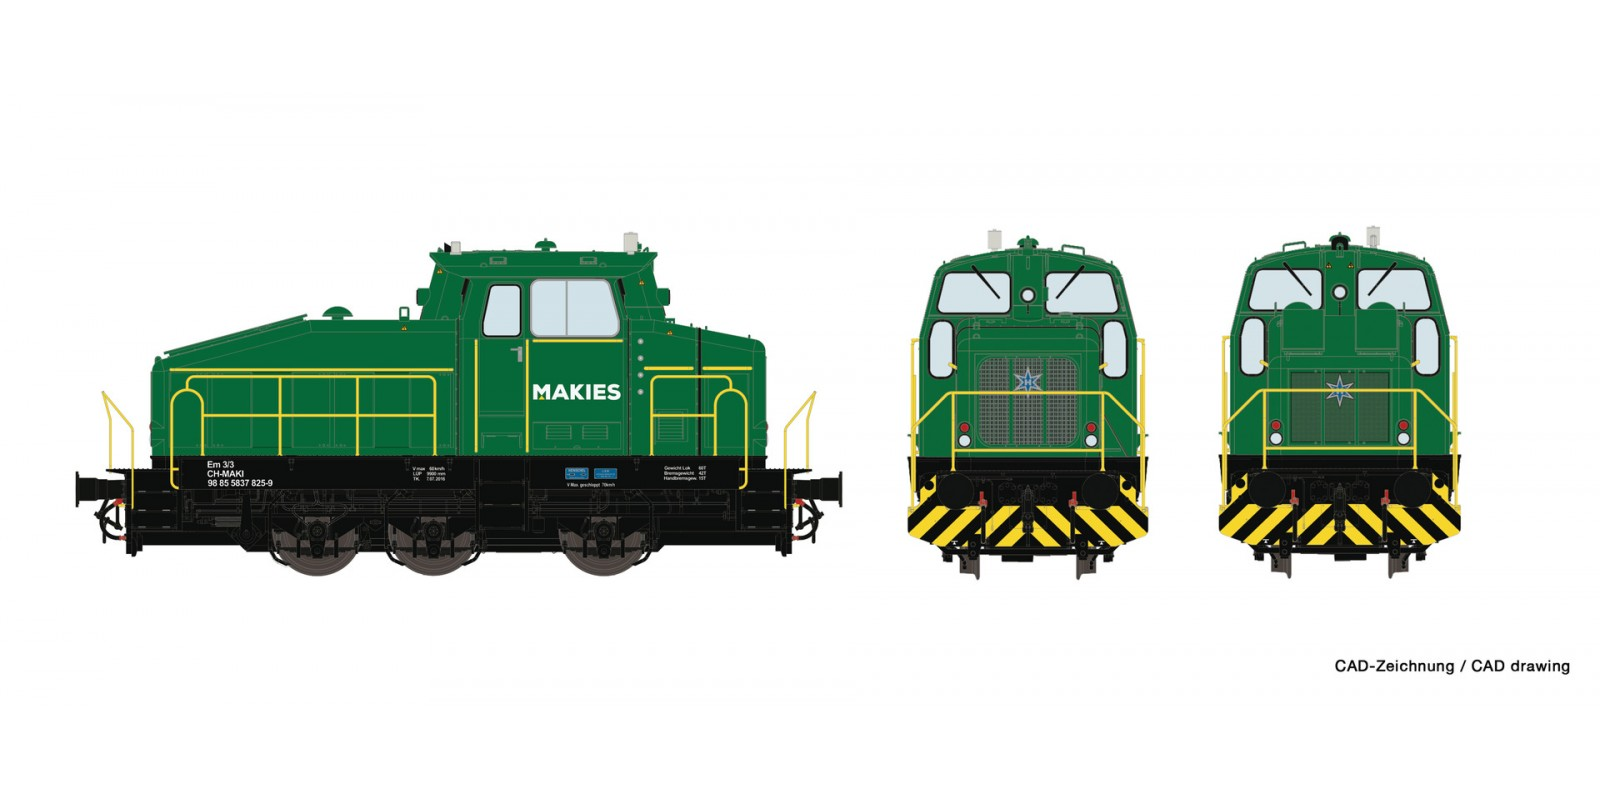 RO78180 Diesel locomotive Em 3/3